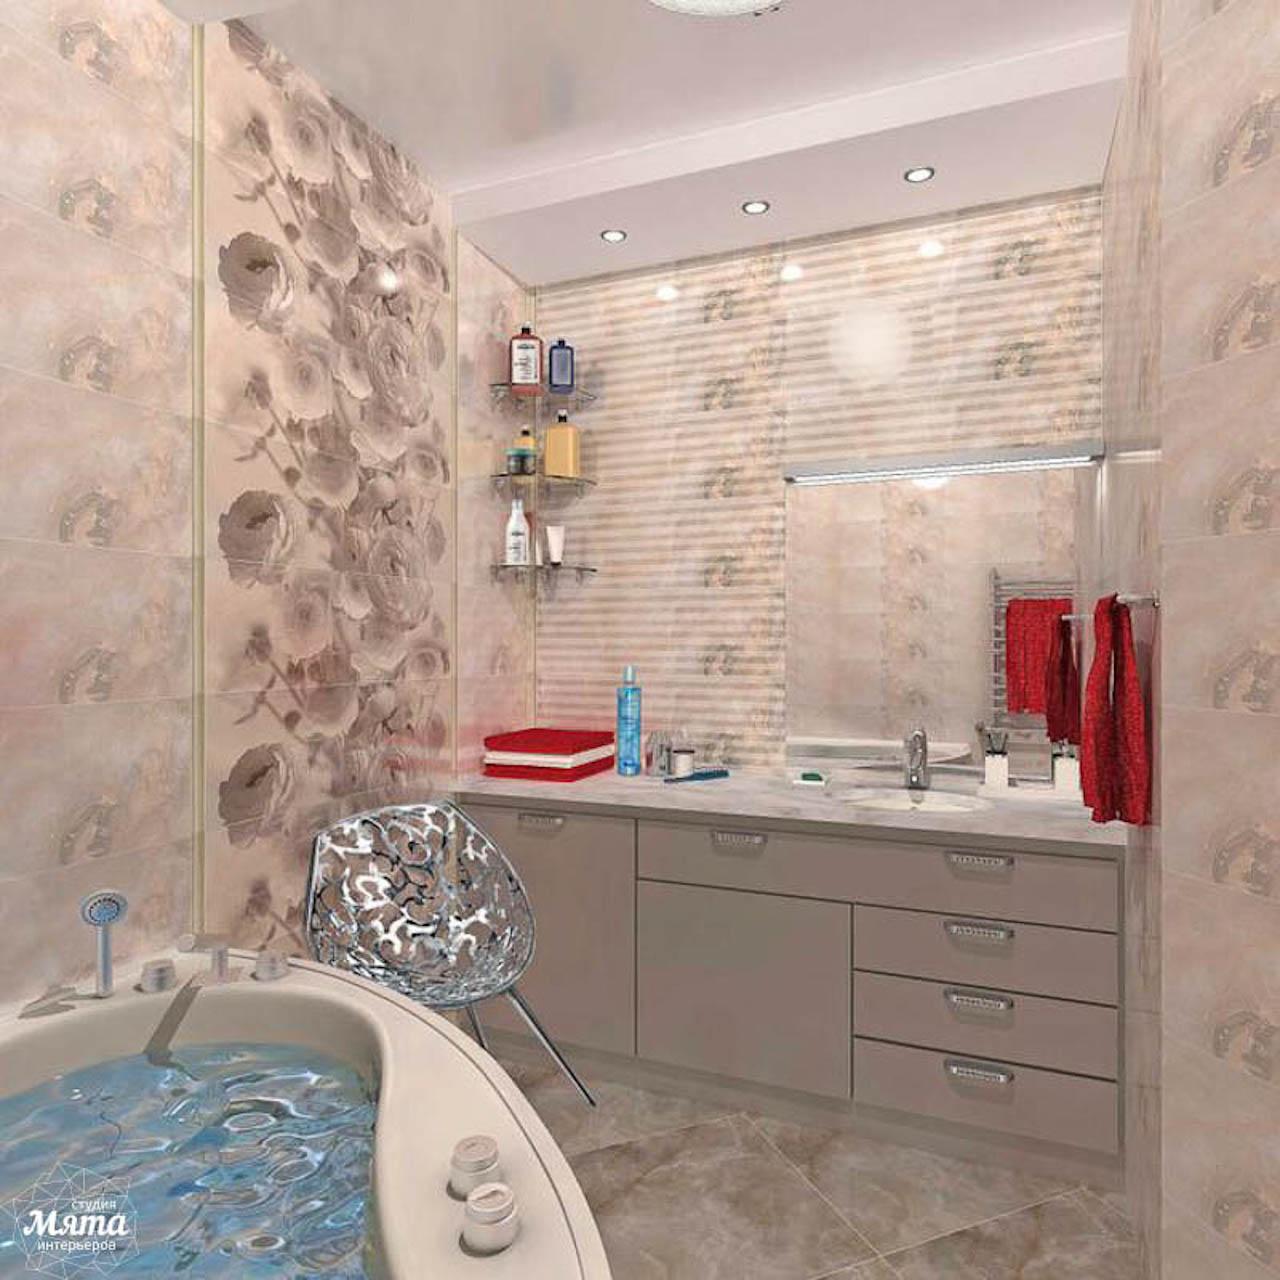 Дизайн интерьера двухкомнатной квартиры по ул. Юмашева 10 img340379510